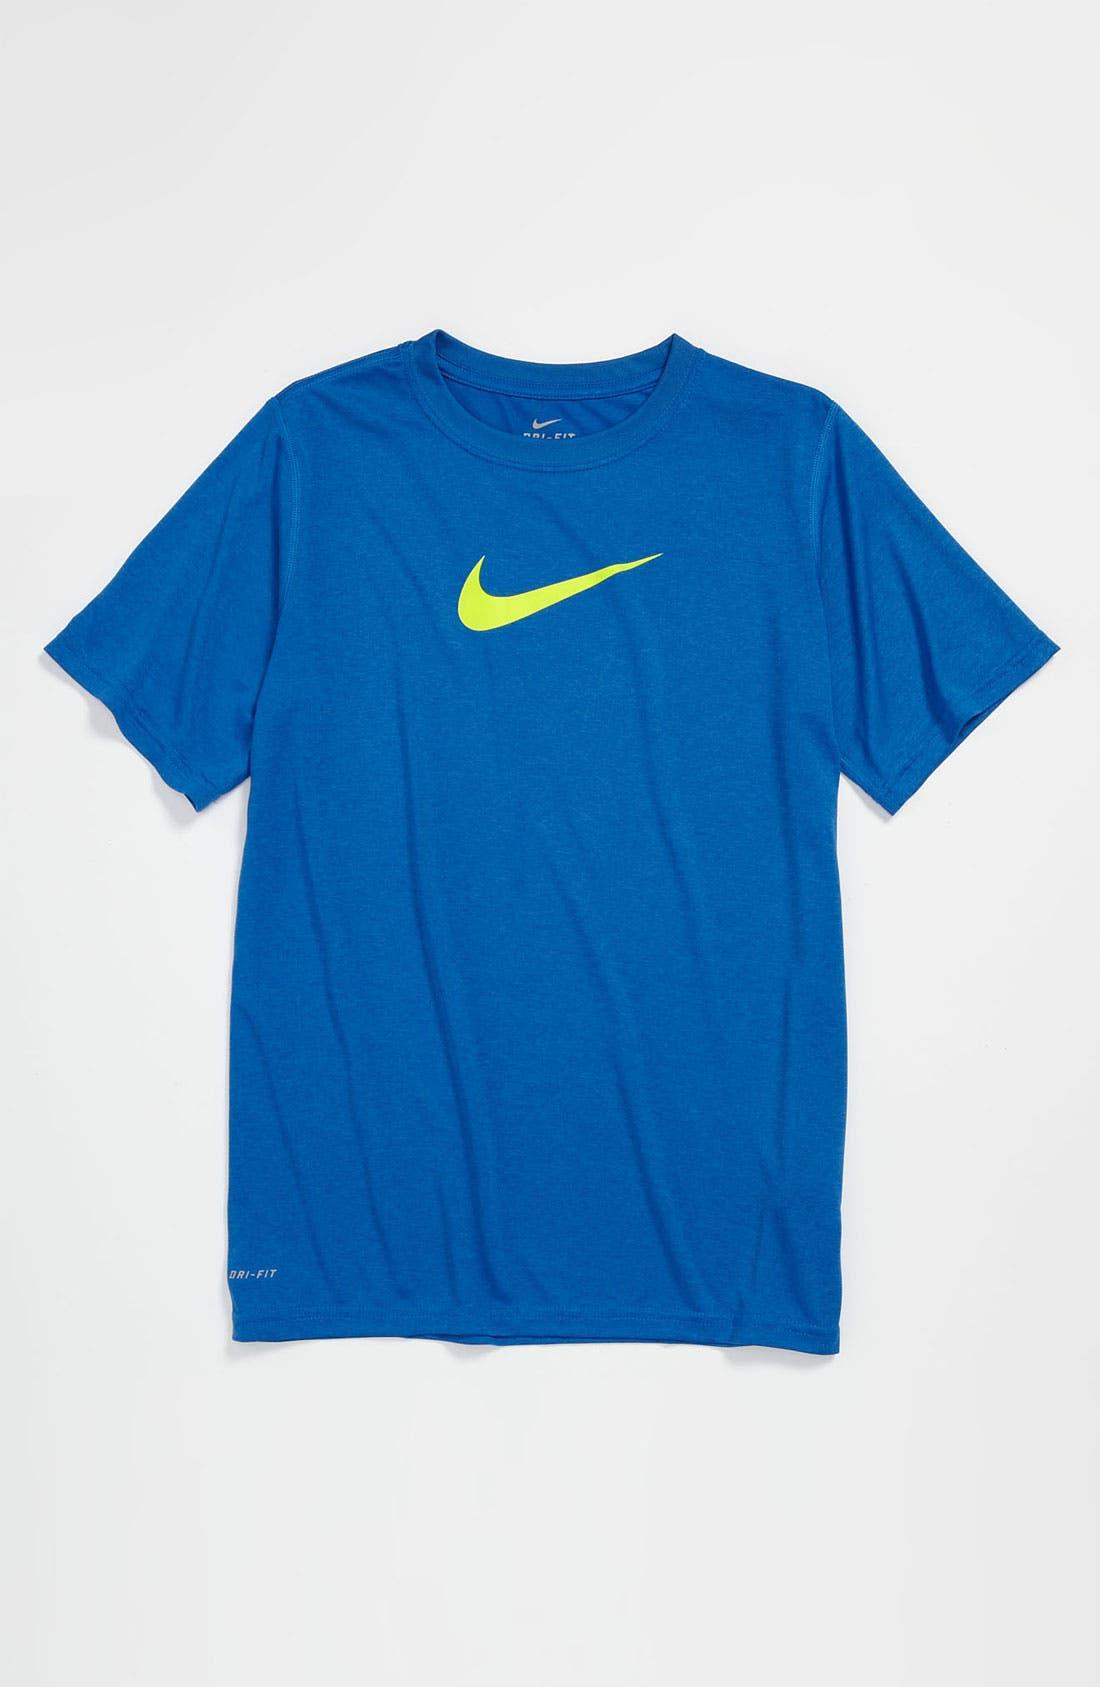 Alternate Image 1 Selected - Nike 'Legends' Dri-FIT Crewneck T-Shirt (Big Boys)